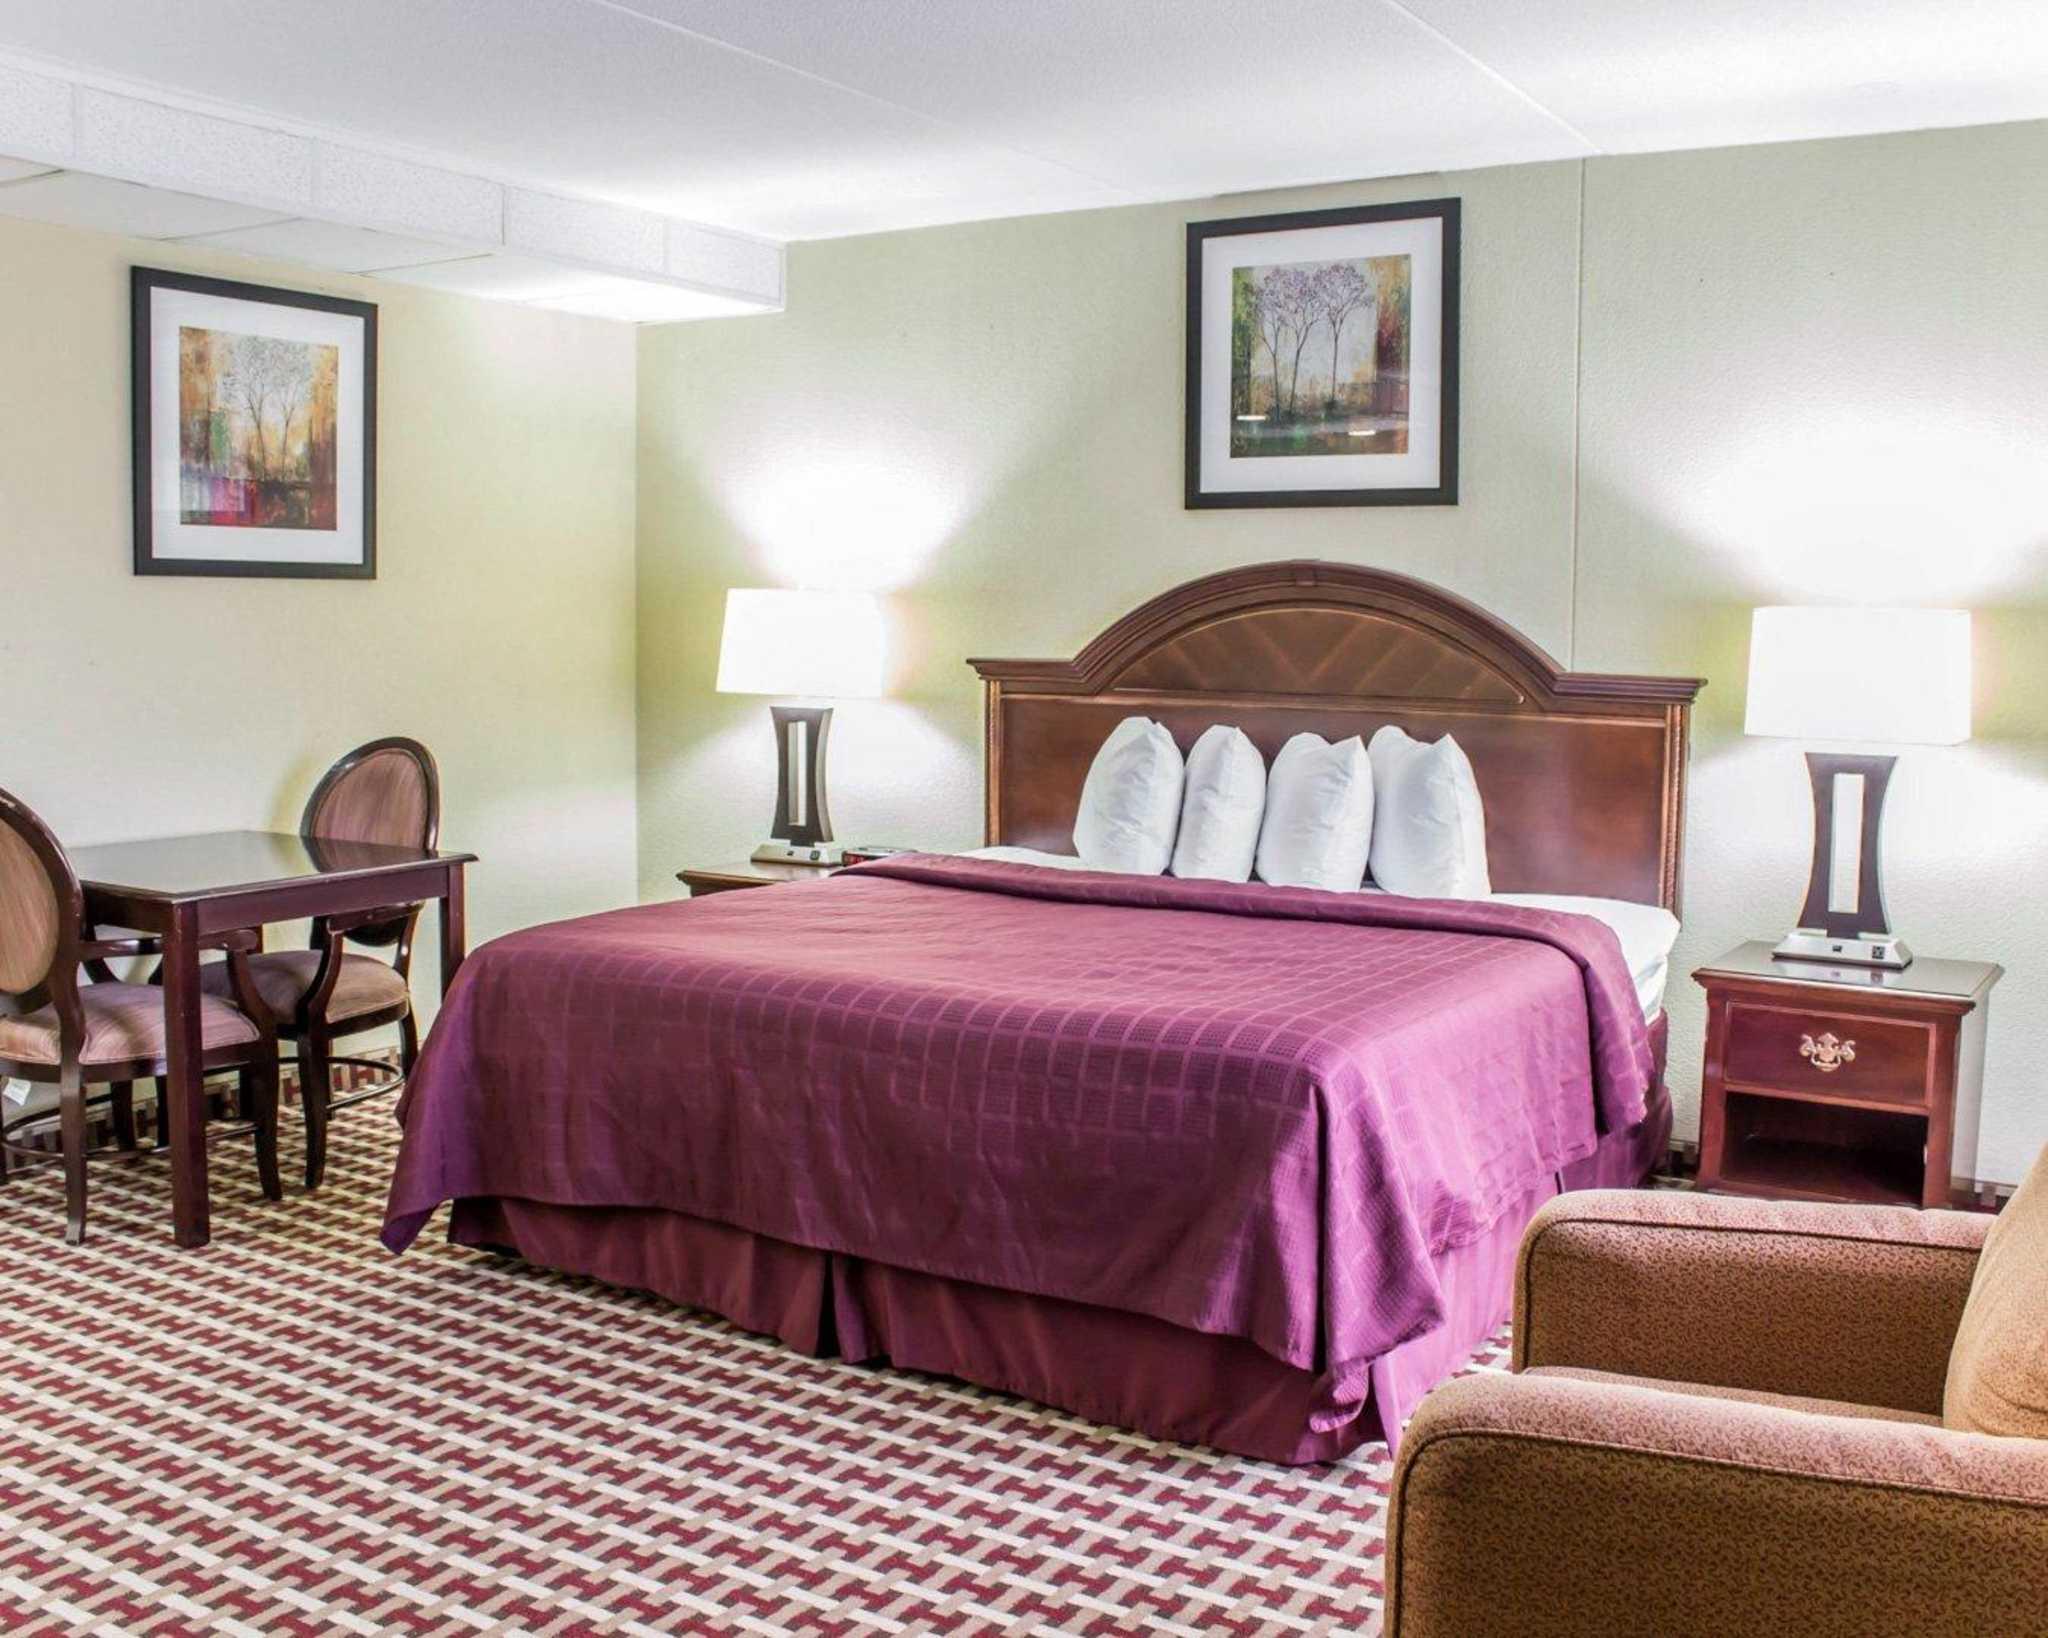 Quality Inn & Suites Fort Bragg image 24